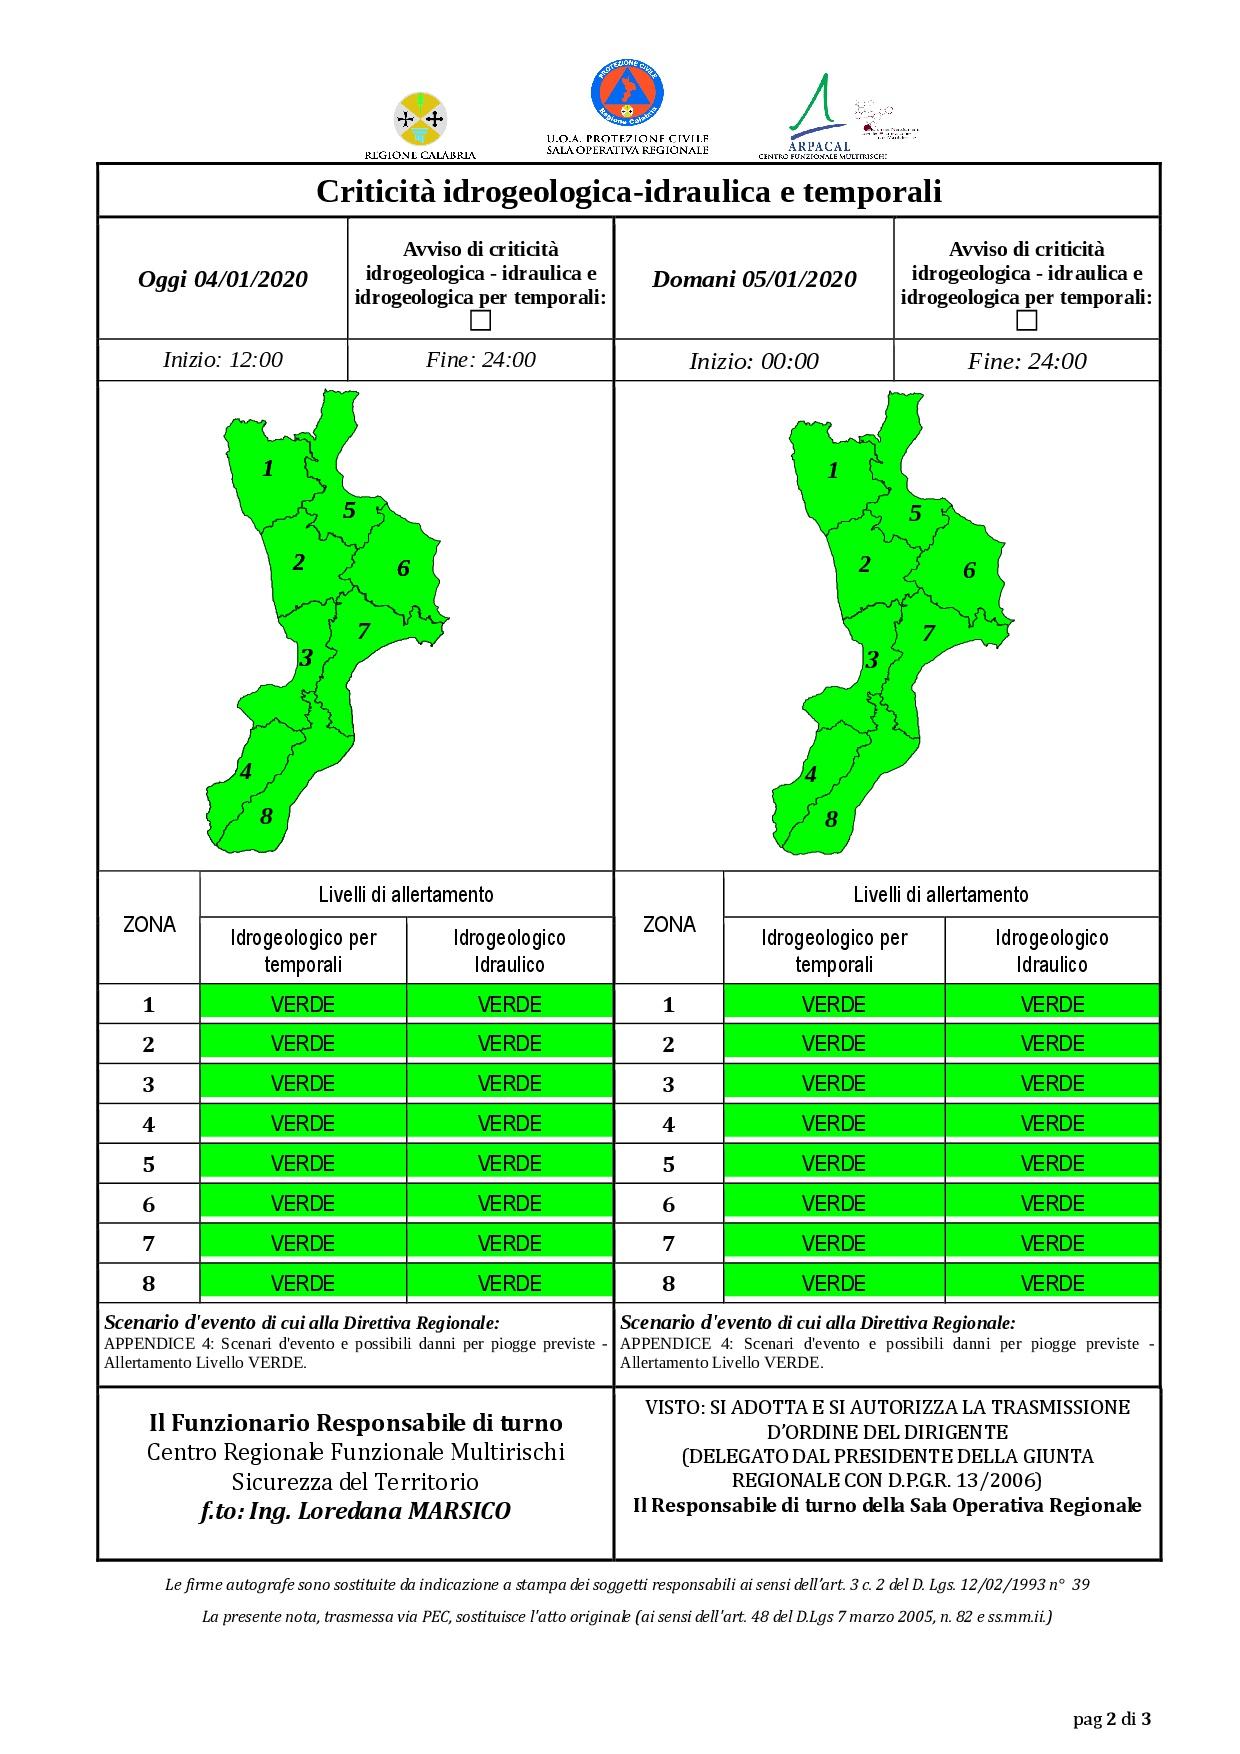 Criticità idrogeologica-idraulica e temporali in Calabria 04-01-2020